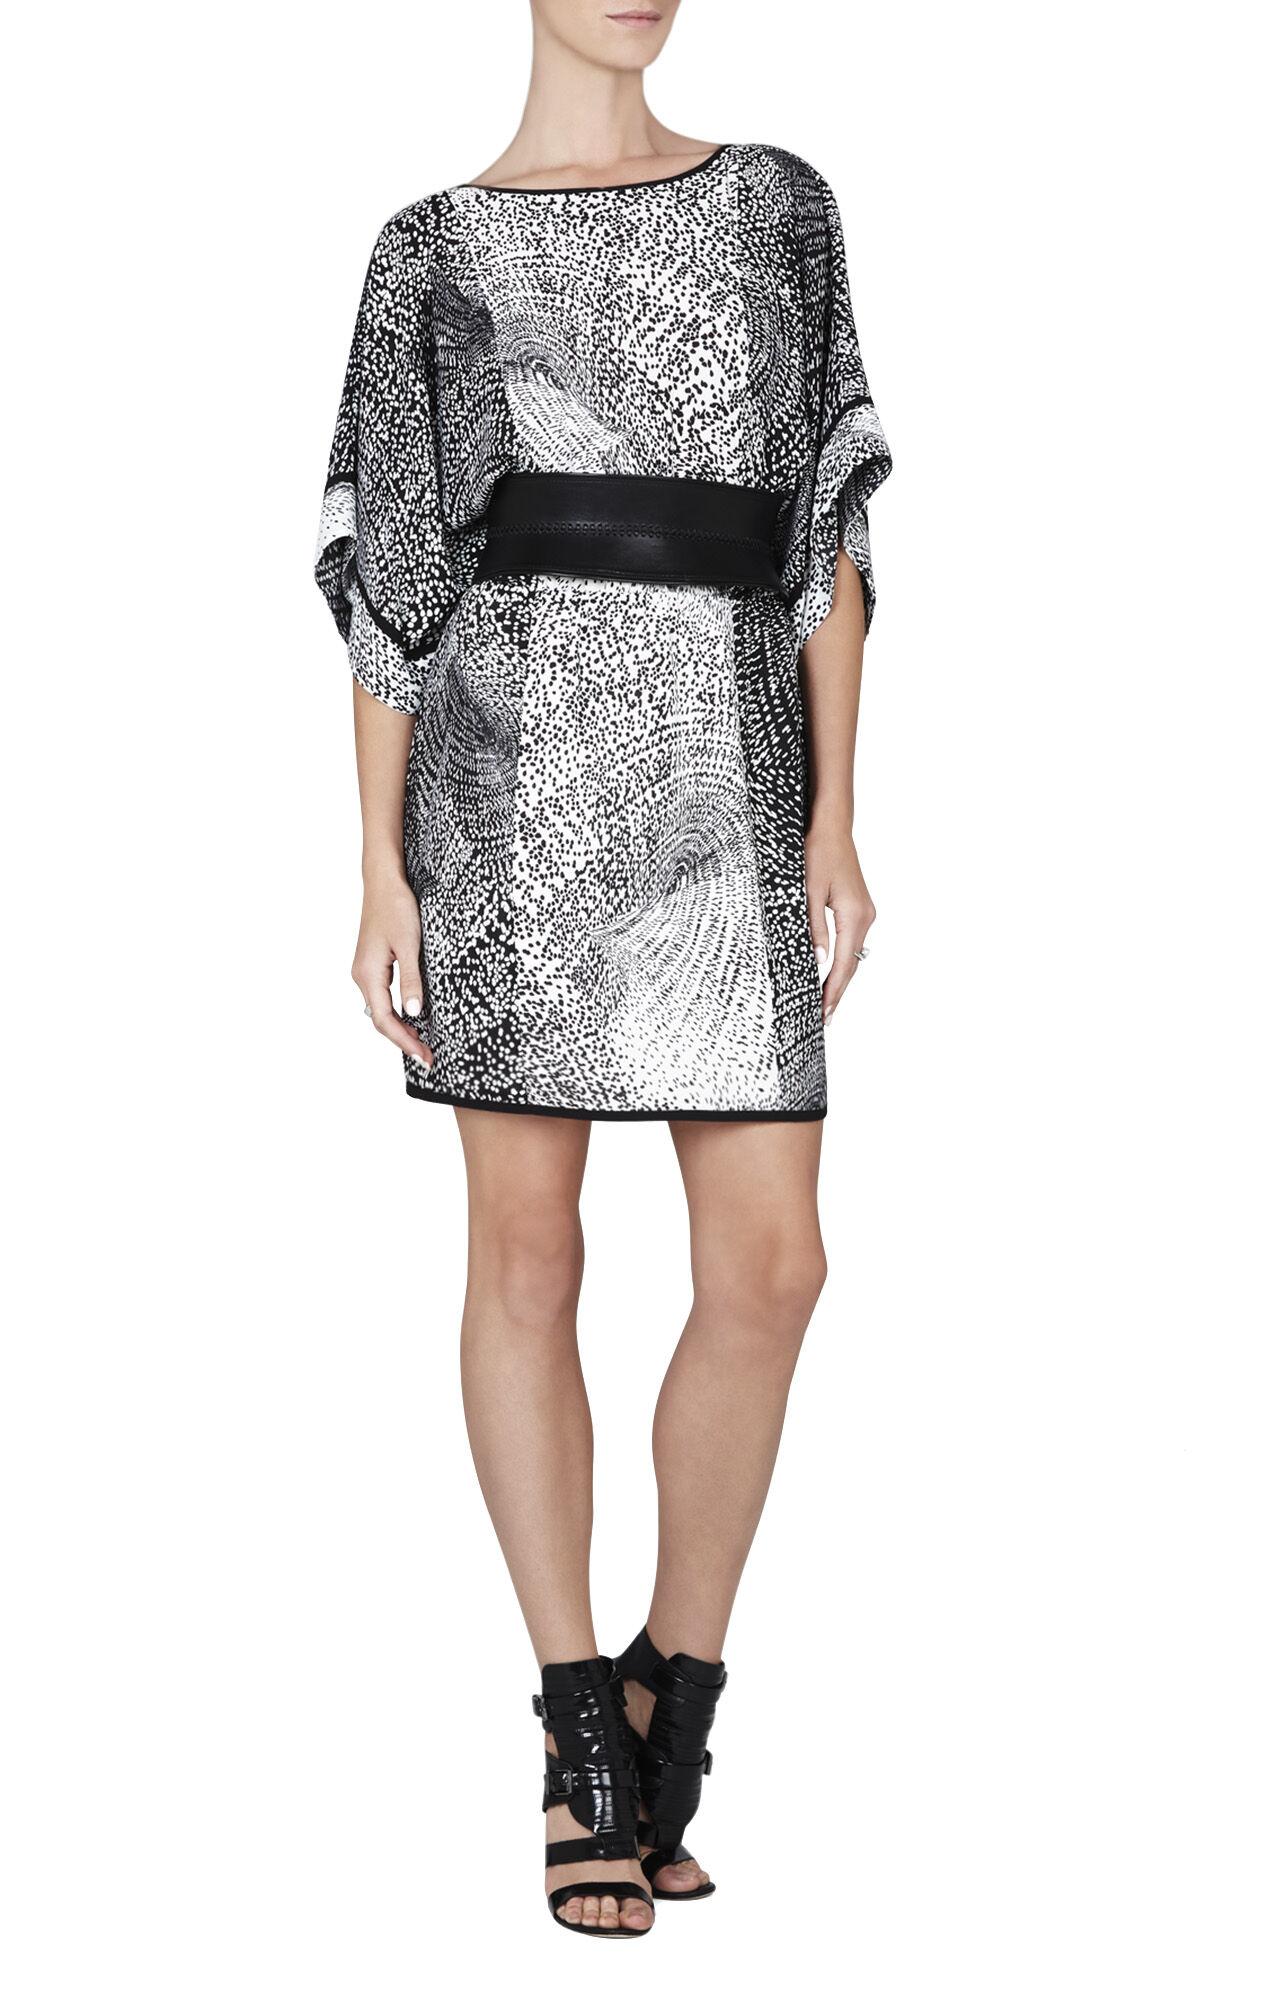 Lois Print-Blocked Kimono Dress